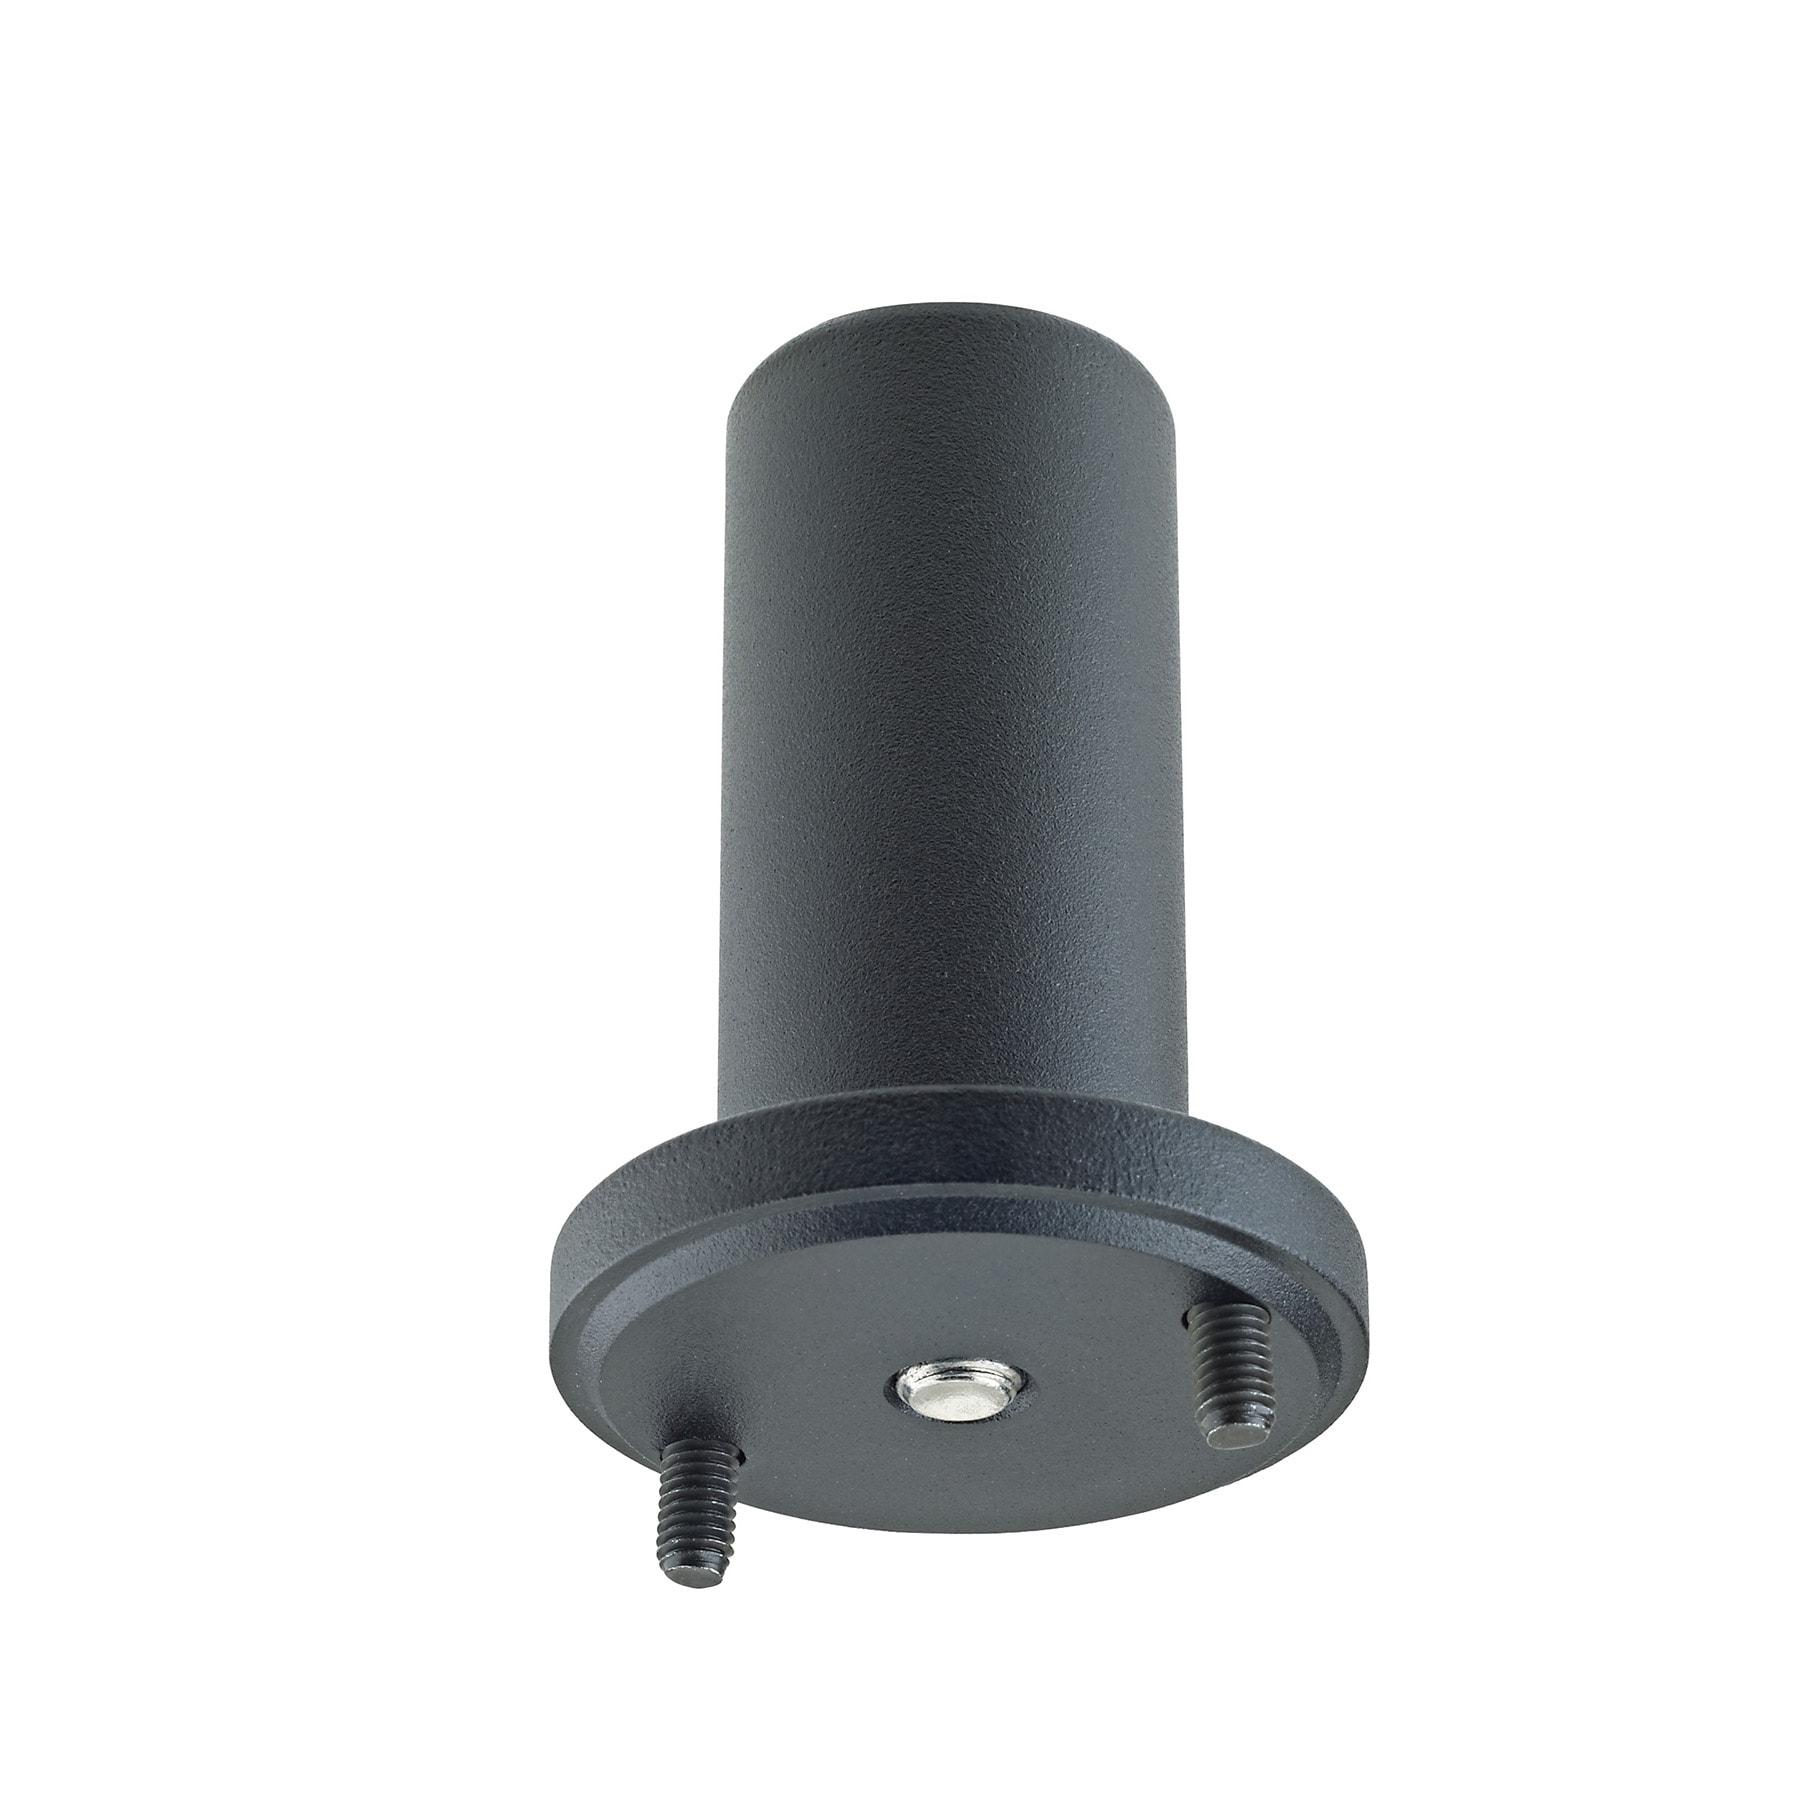 KM26793 - Adapter